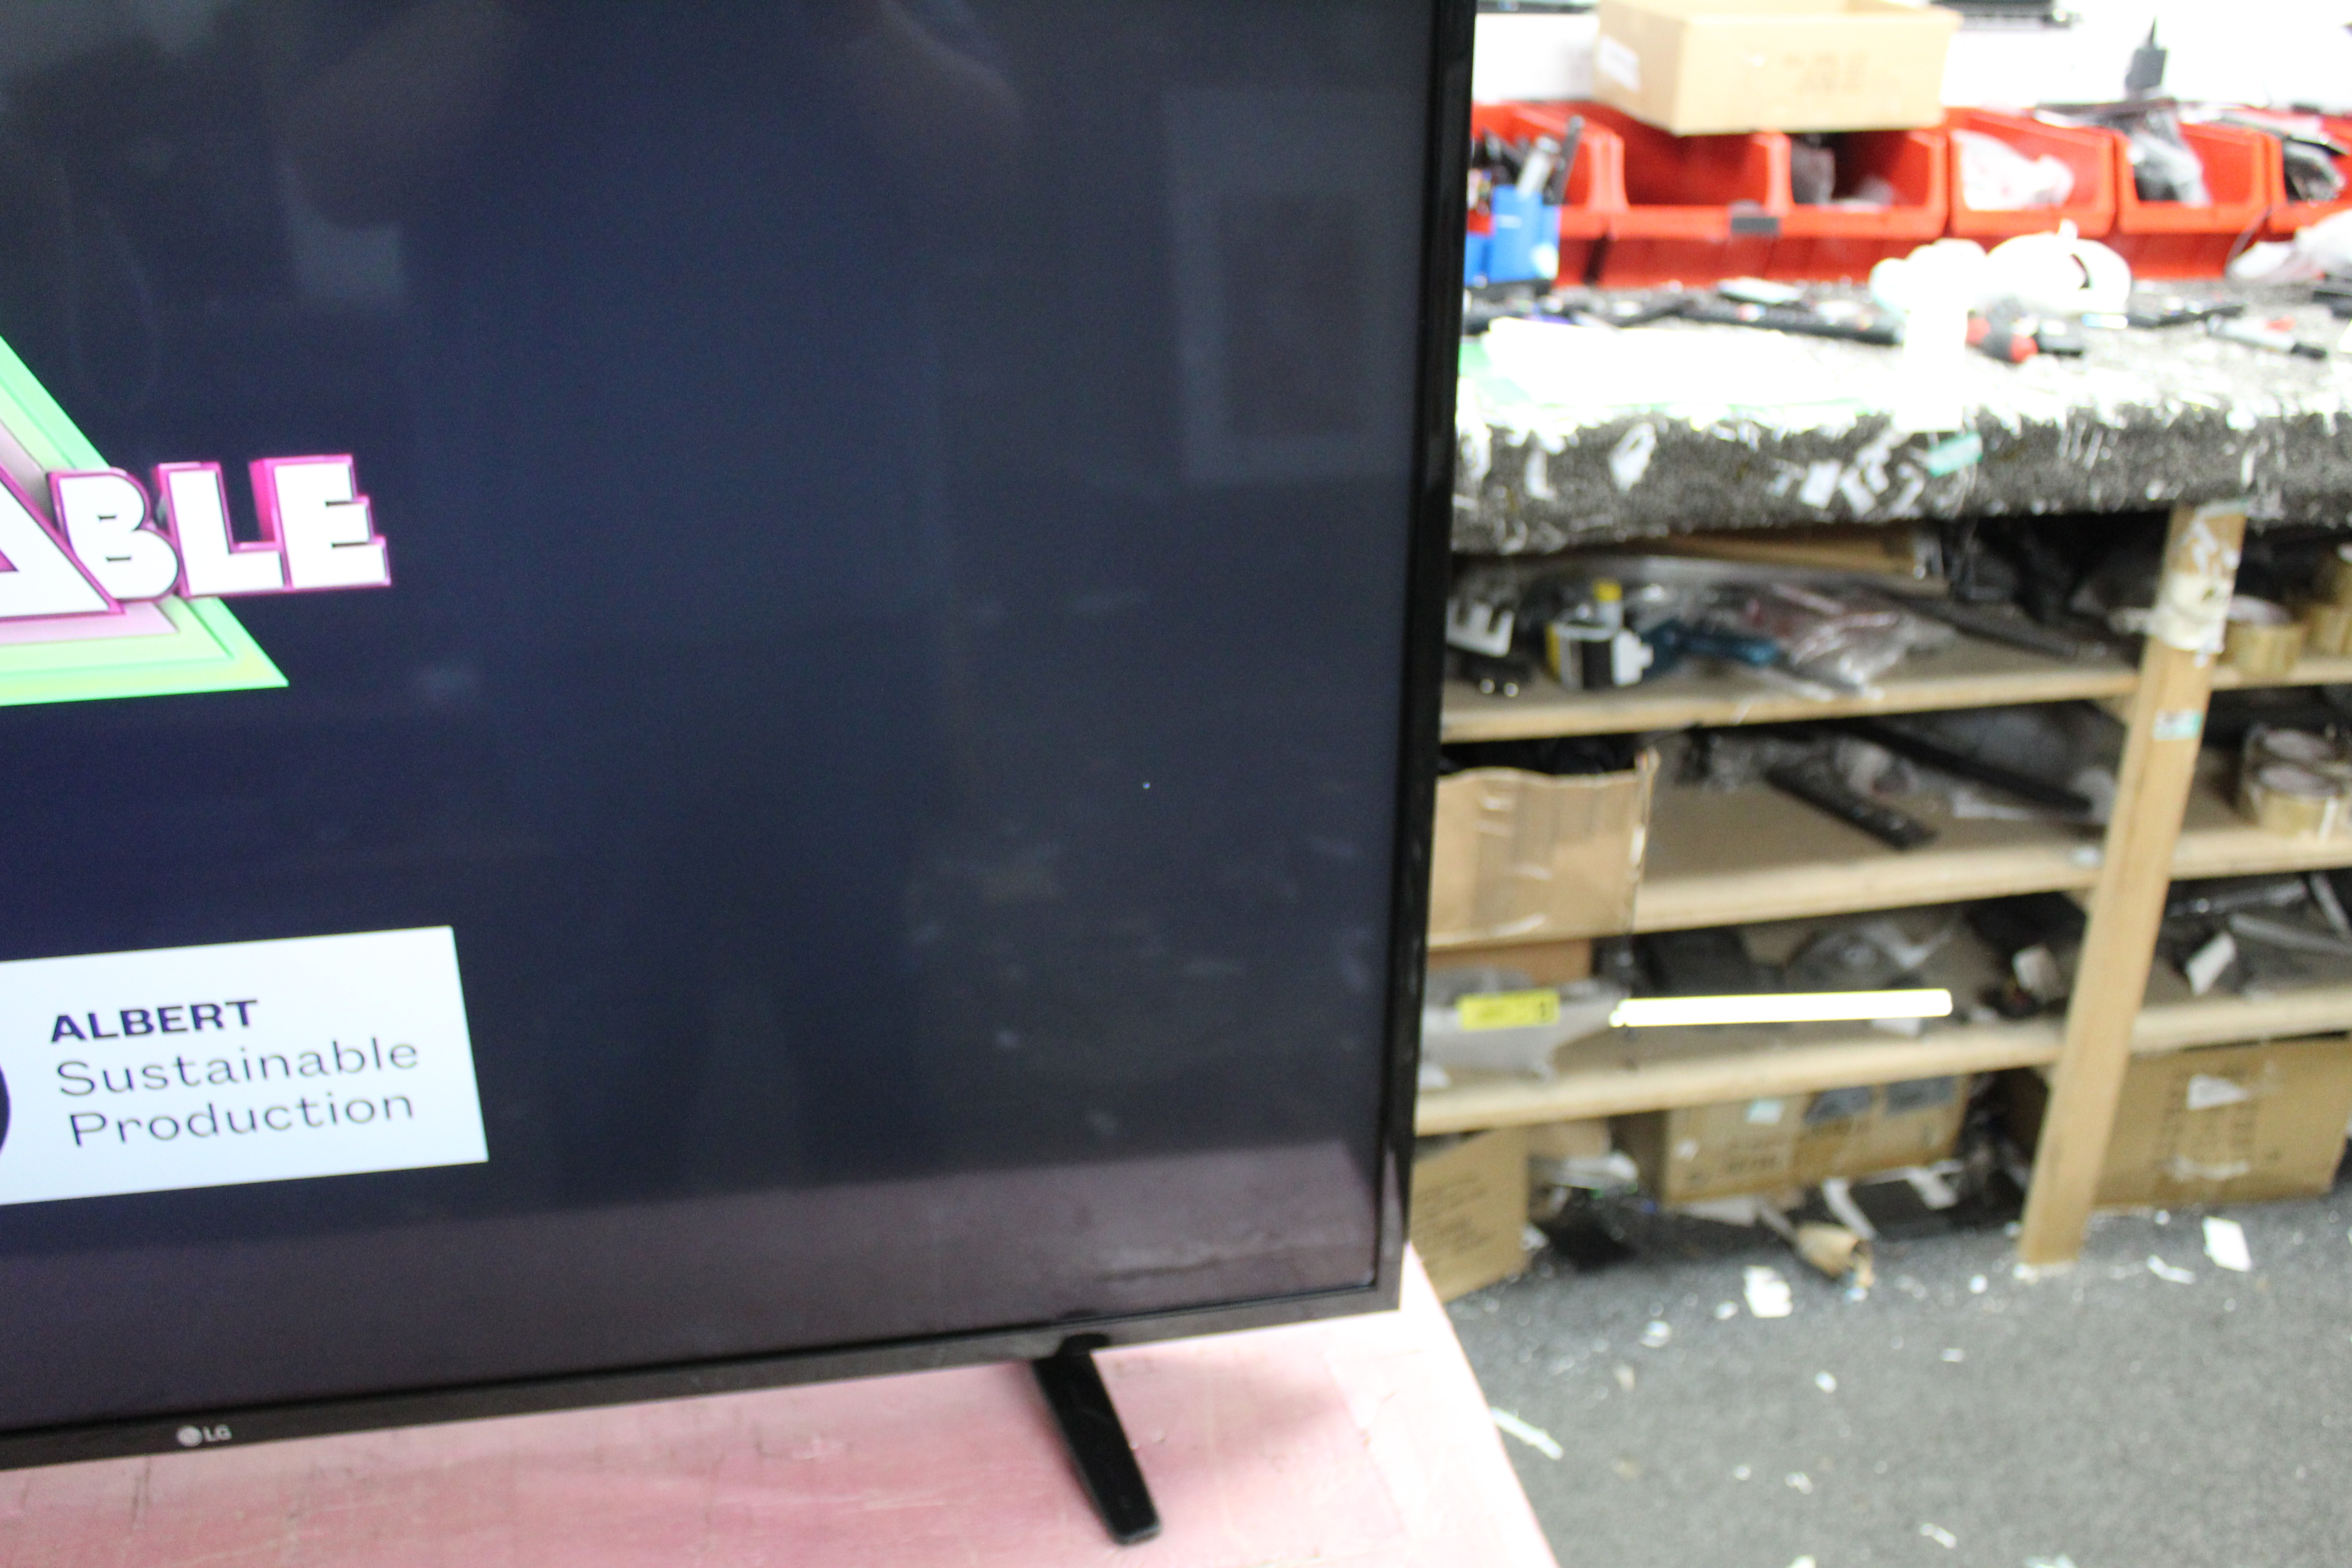 49 LG 49UH620V 4K Ultra HD Freeview HD Smart HDR LED TV